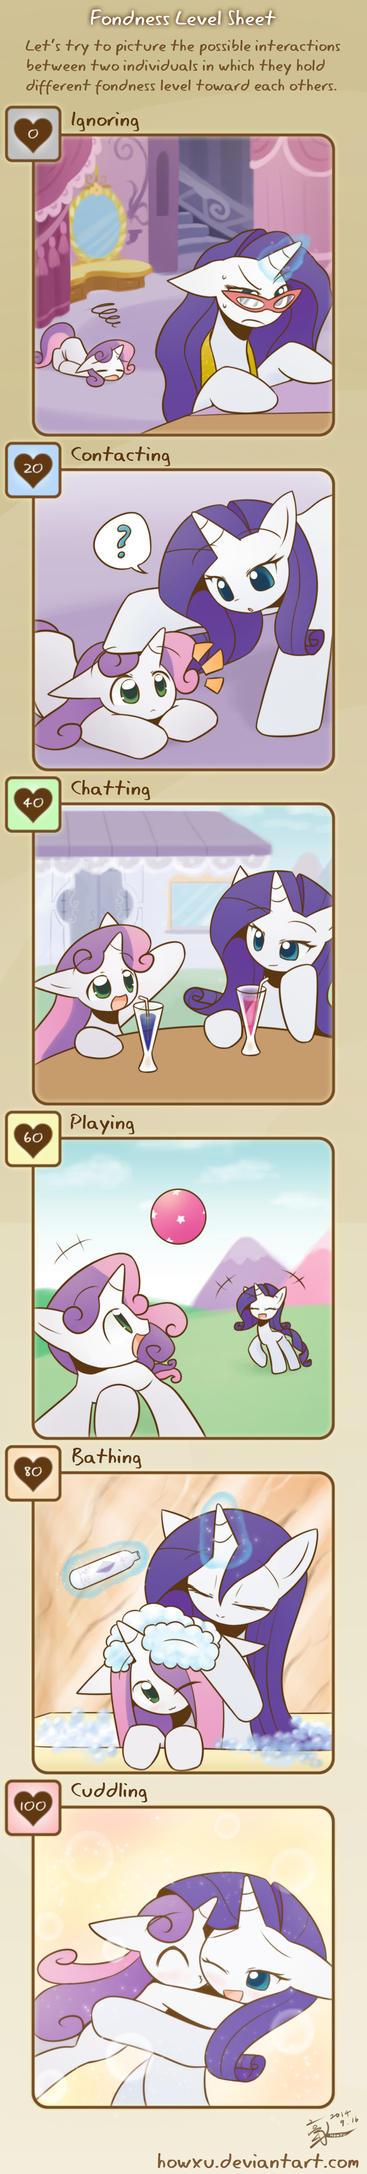 Fondness level of unicorn sisters by HowXu